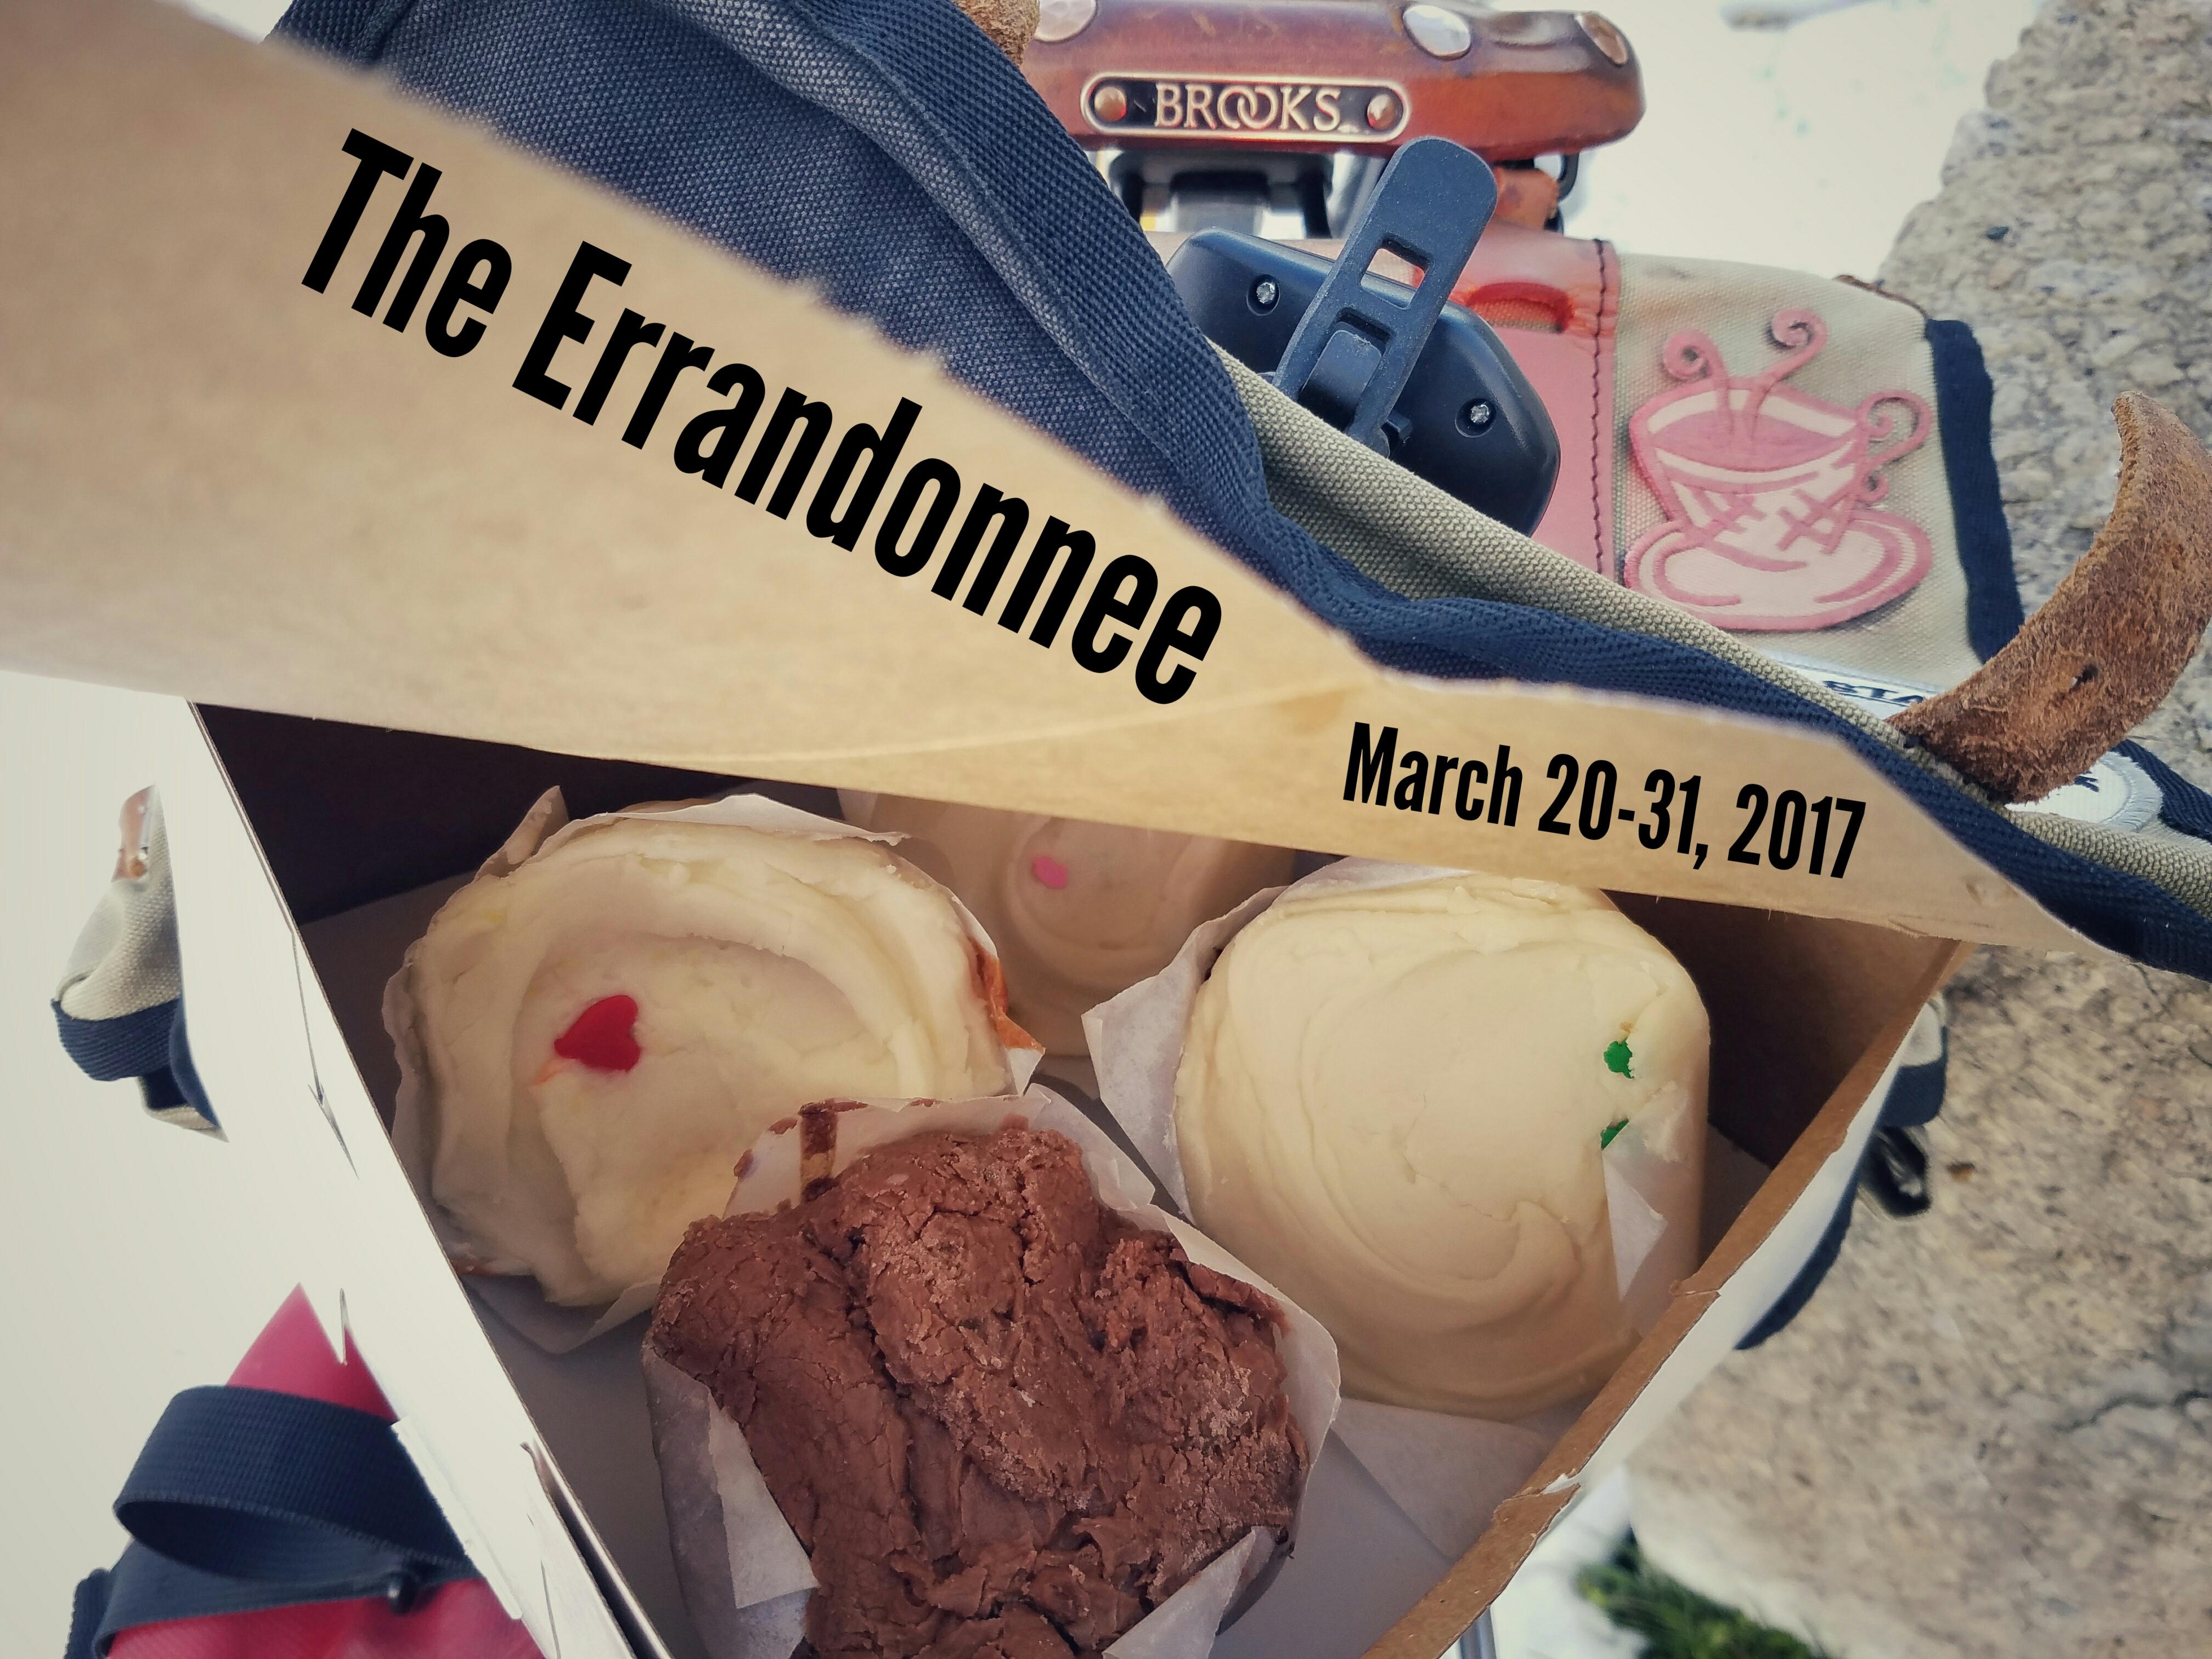 Eranndonnee 2017